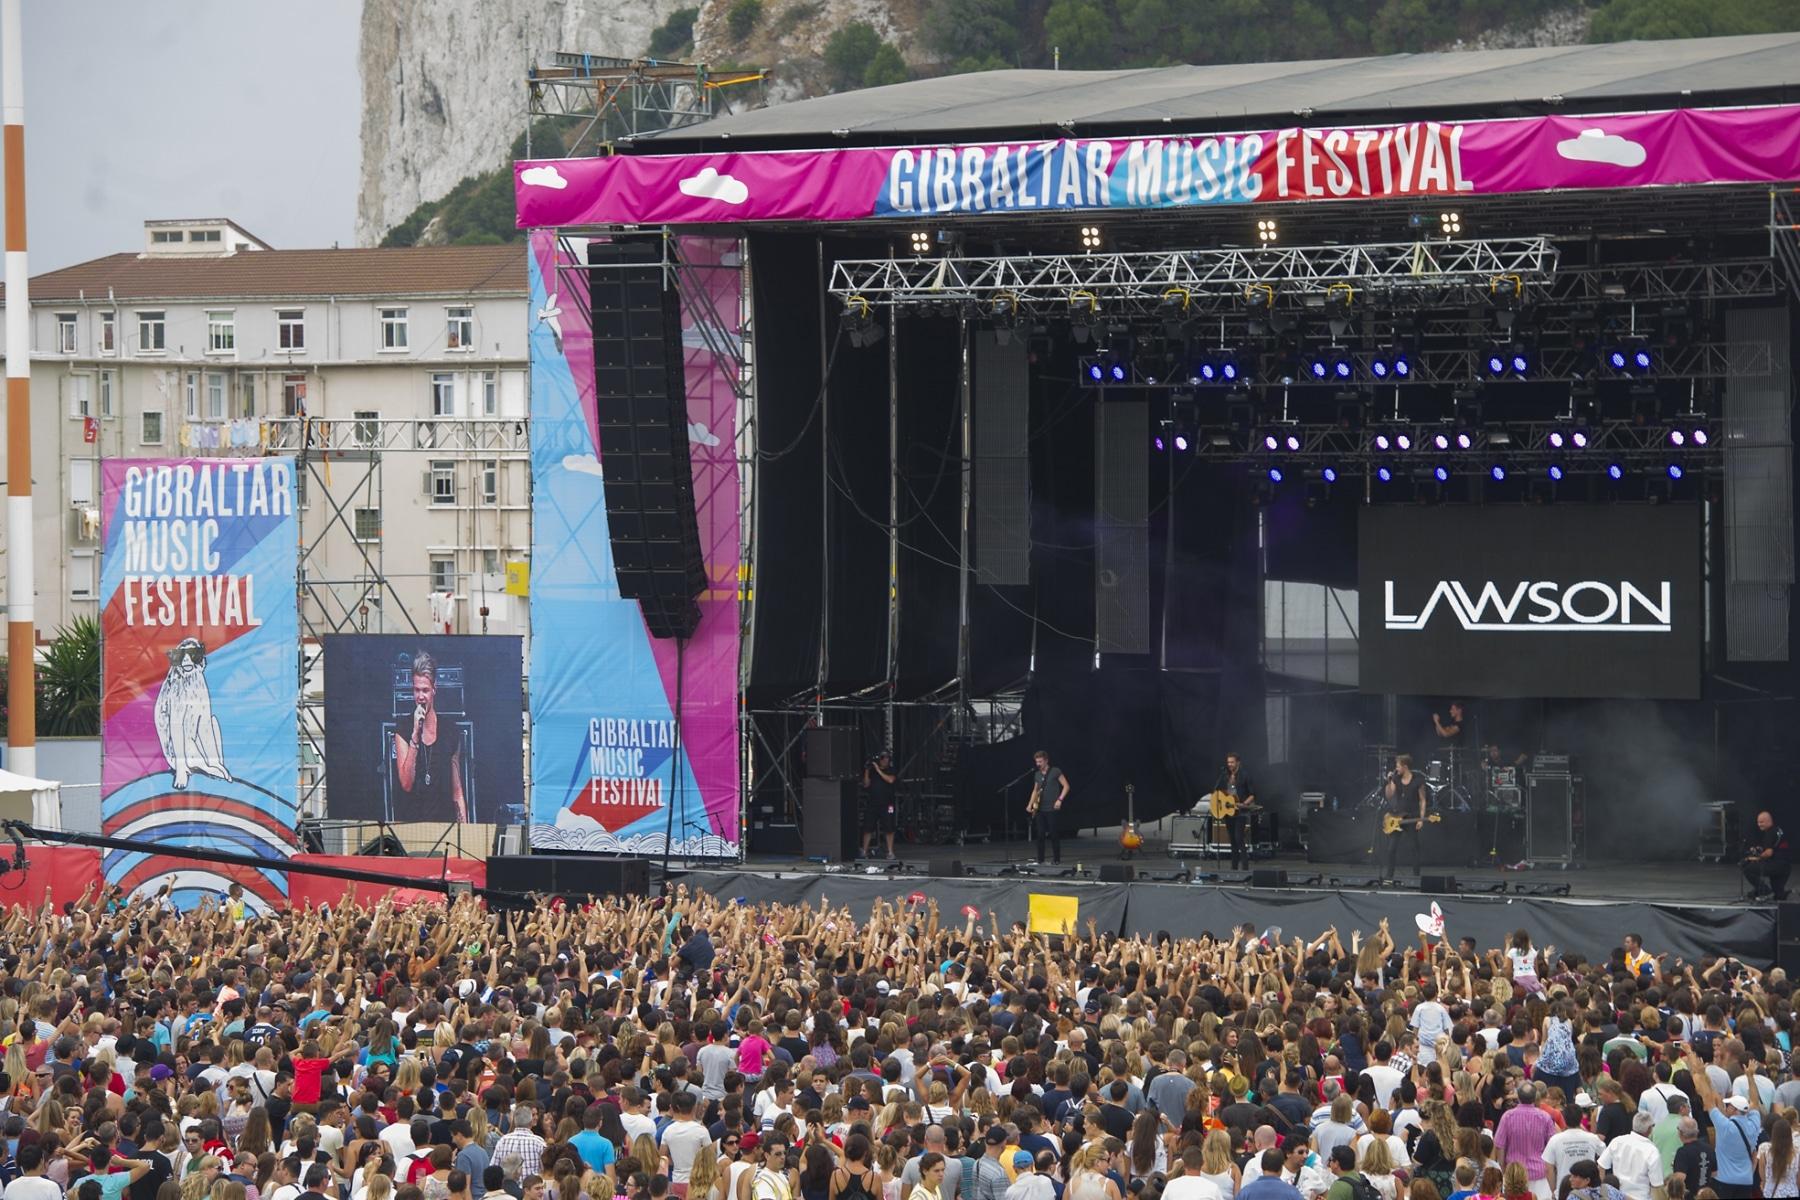 gibraltar-music-festival-2013-lawson_9699900669_o